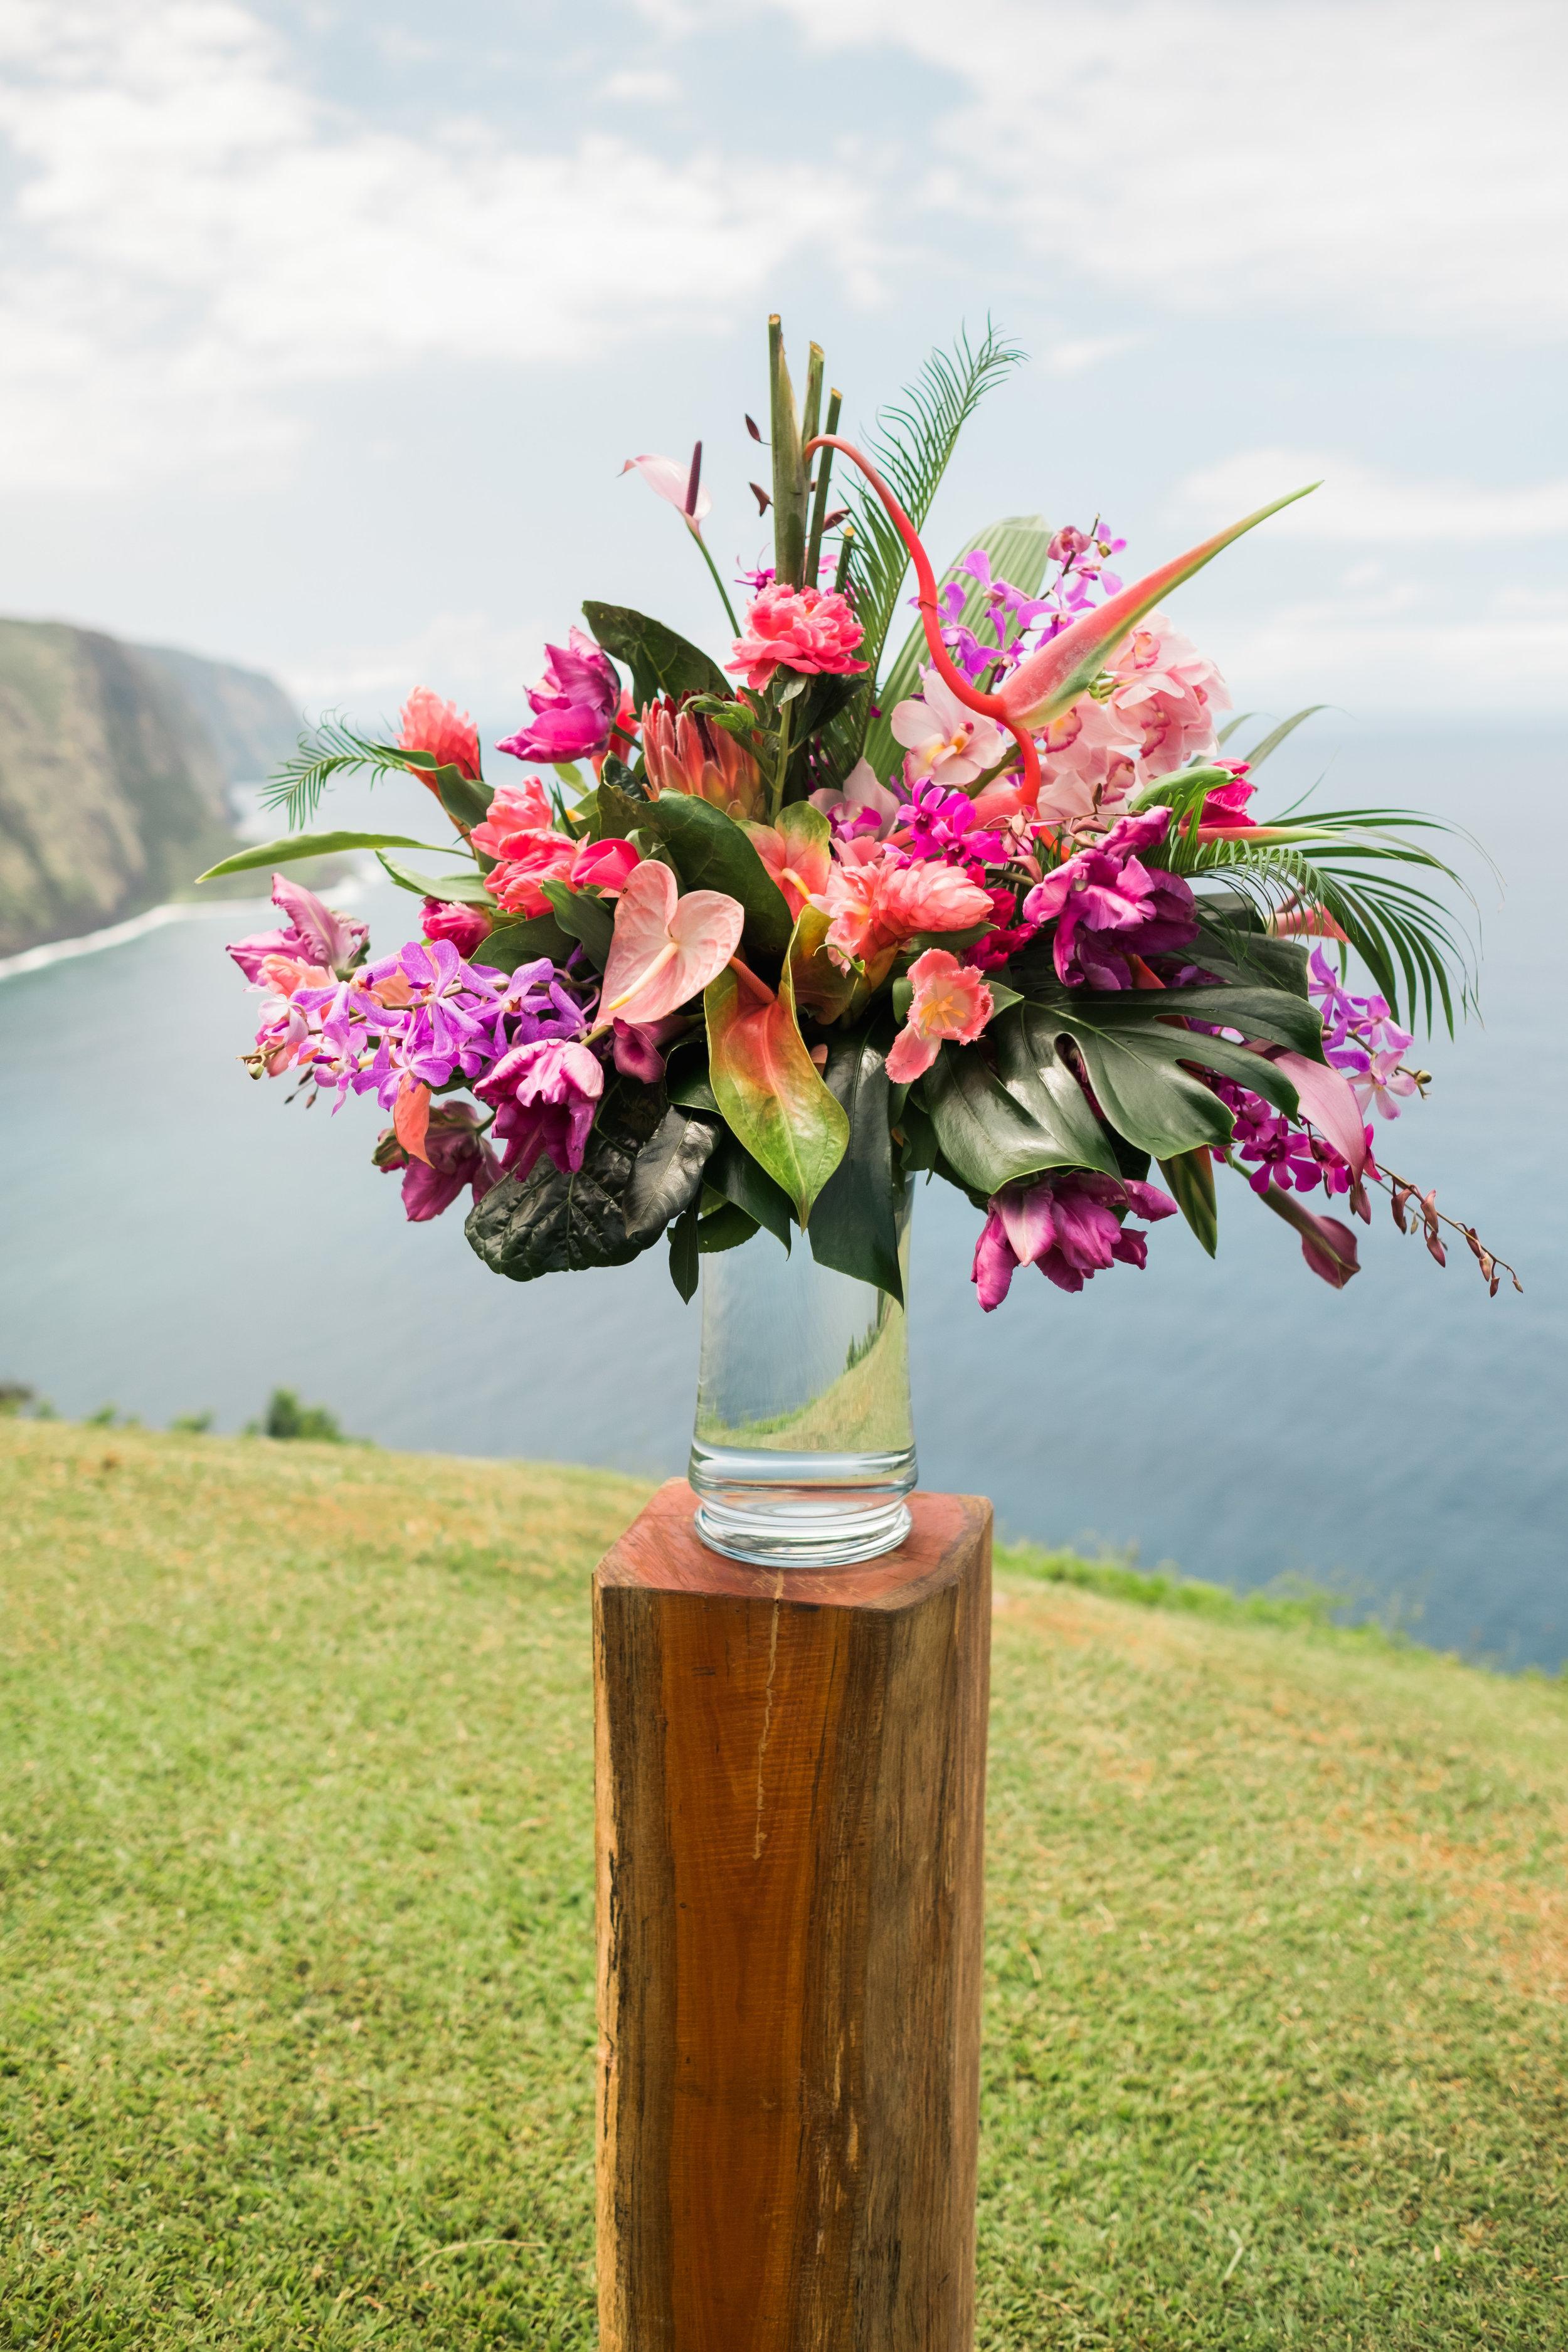 Tropical Arrangement of Orchids, Anthurium, and Birds of Paradise